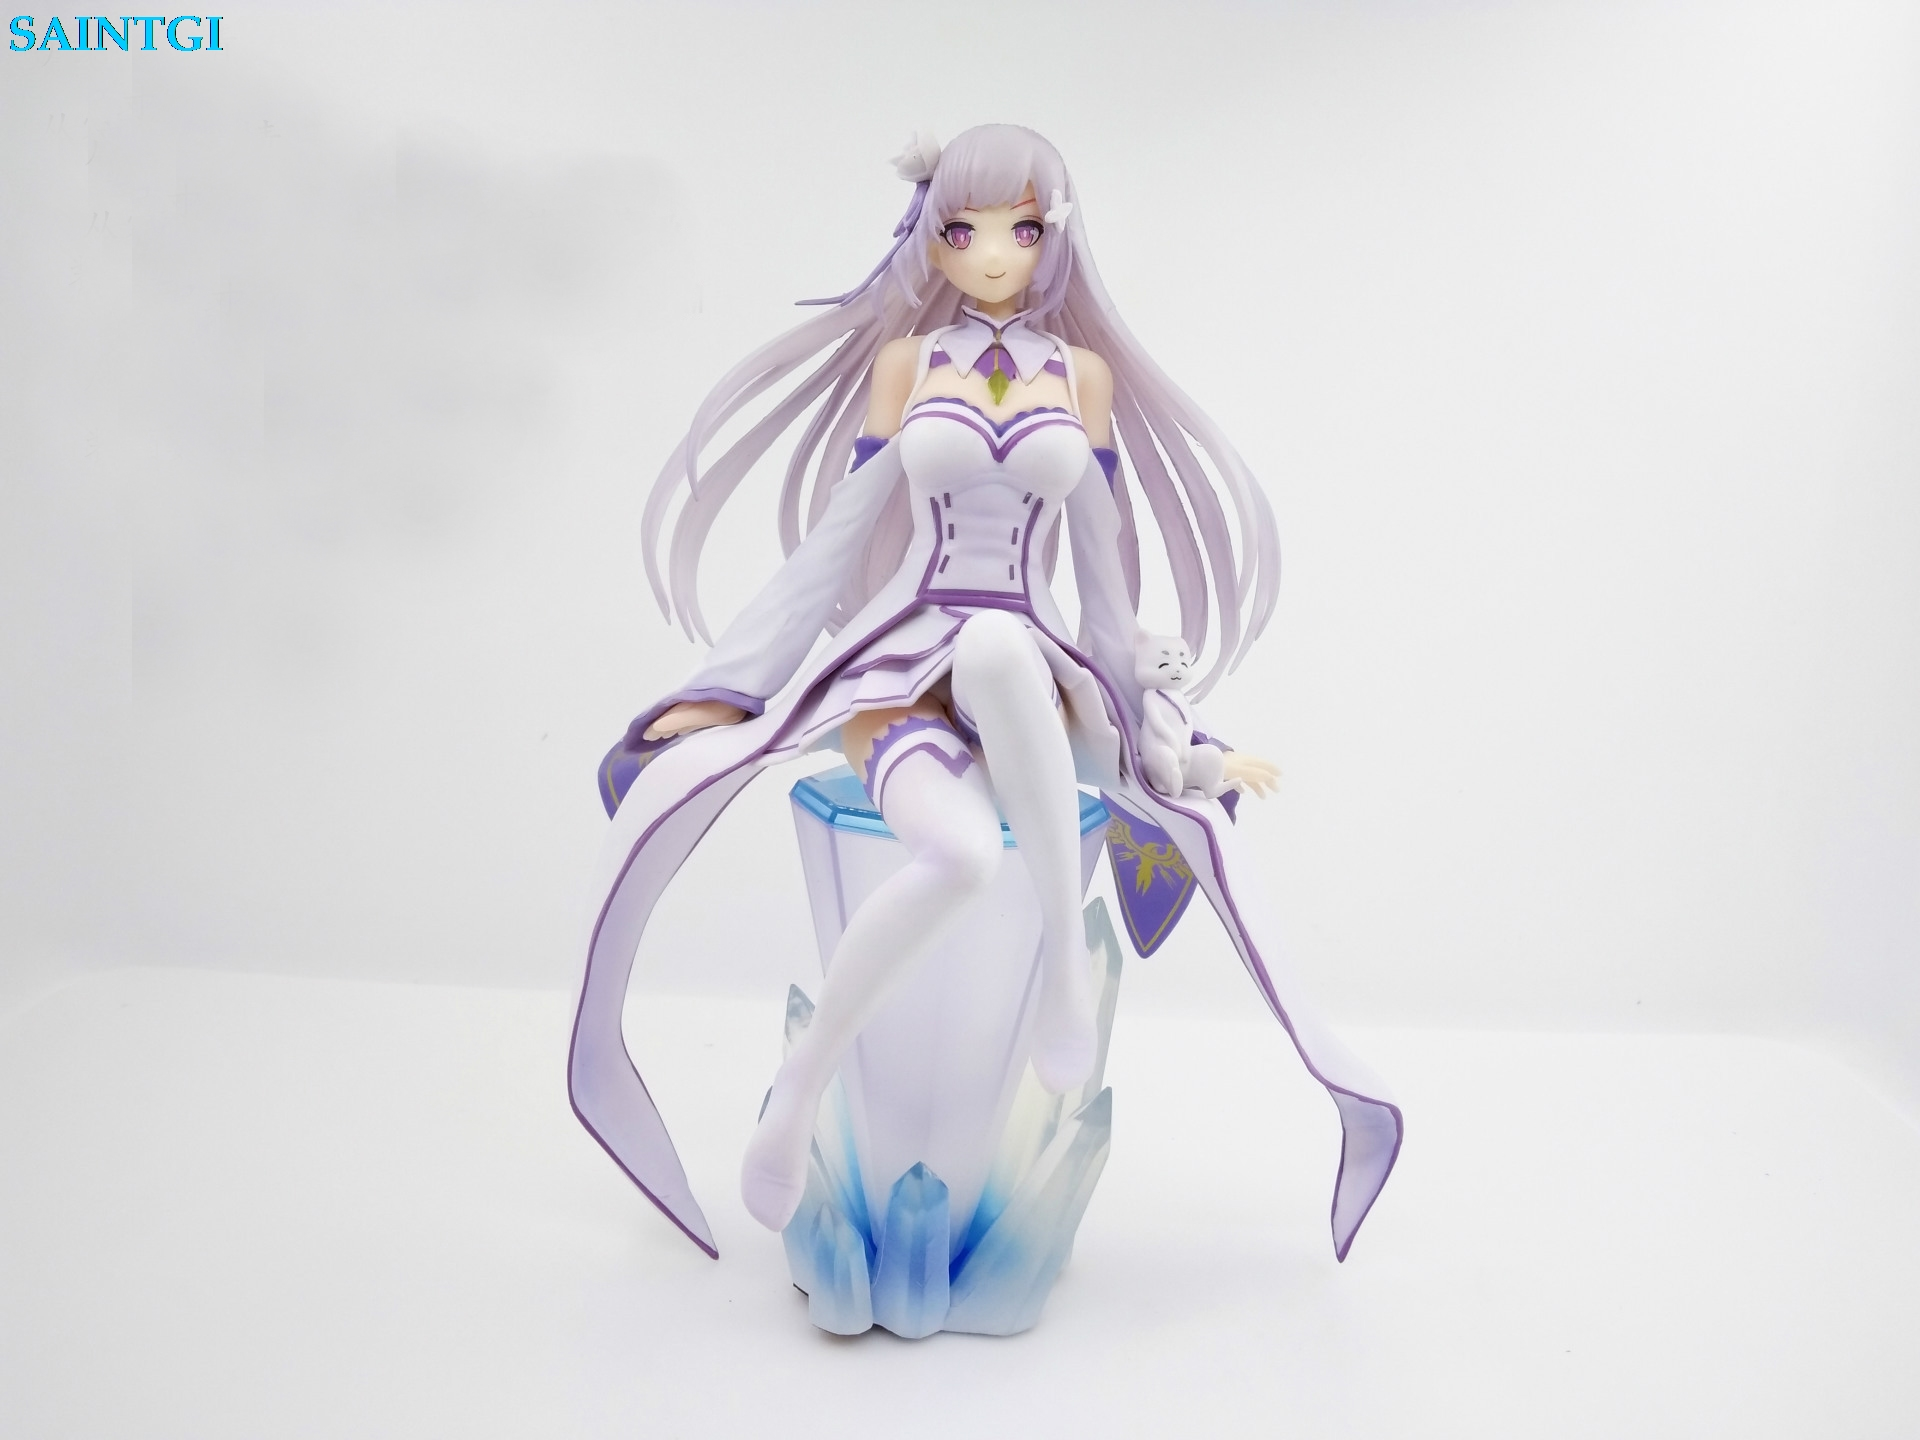 ФОТО SAINTGI Re Zero kara Hajimeru Isekai Seikatsu Emilia Wizard Japanese Anime Gift Action Figure Toys 21cm PVC Collection Model